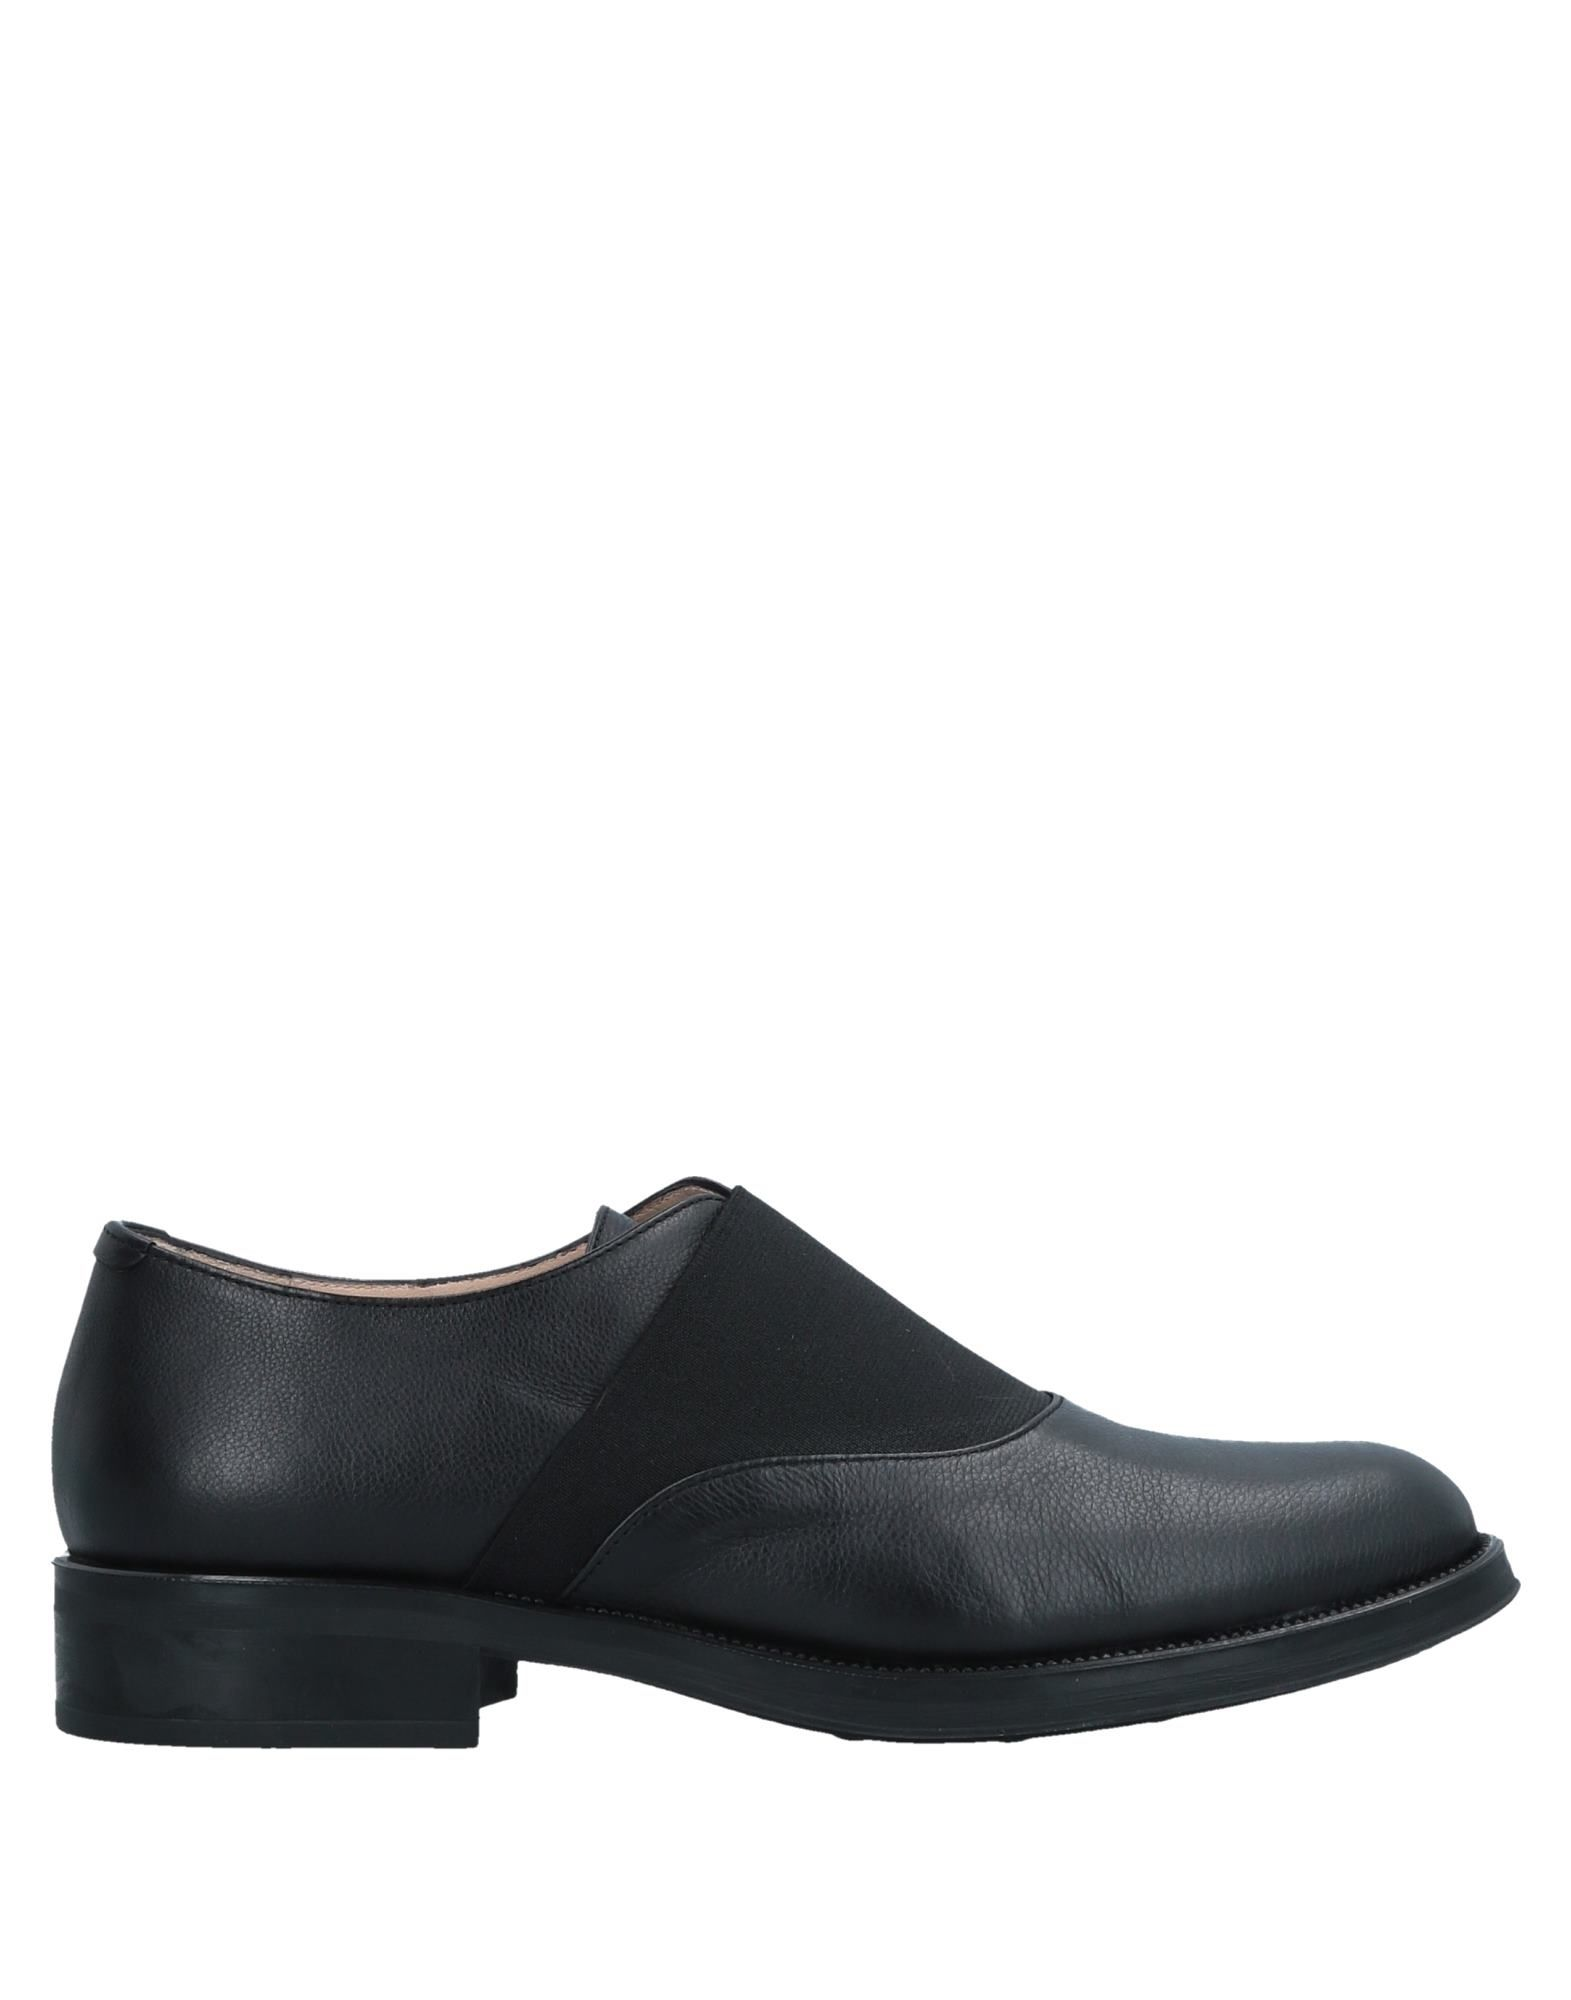 F.Lli Bruglia Mokassins Damen  11520222PDGut aussehende strapazierfähige Schuhe